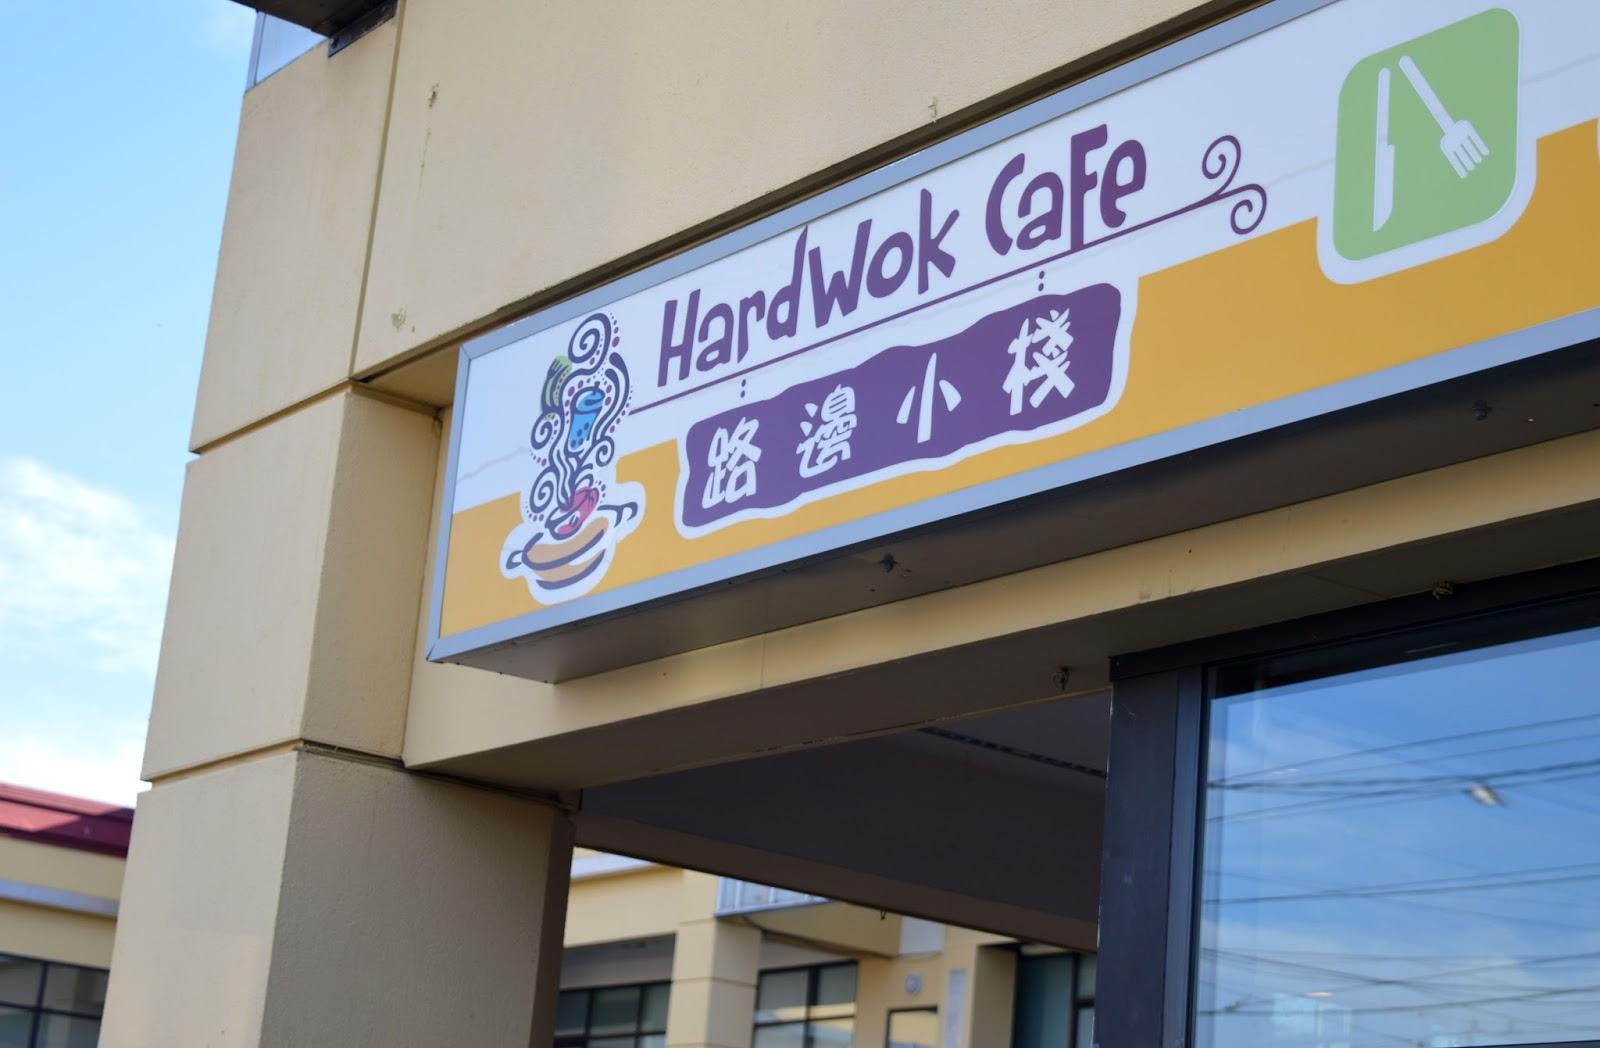 Hard Wok Cafe Seattle